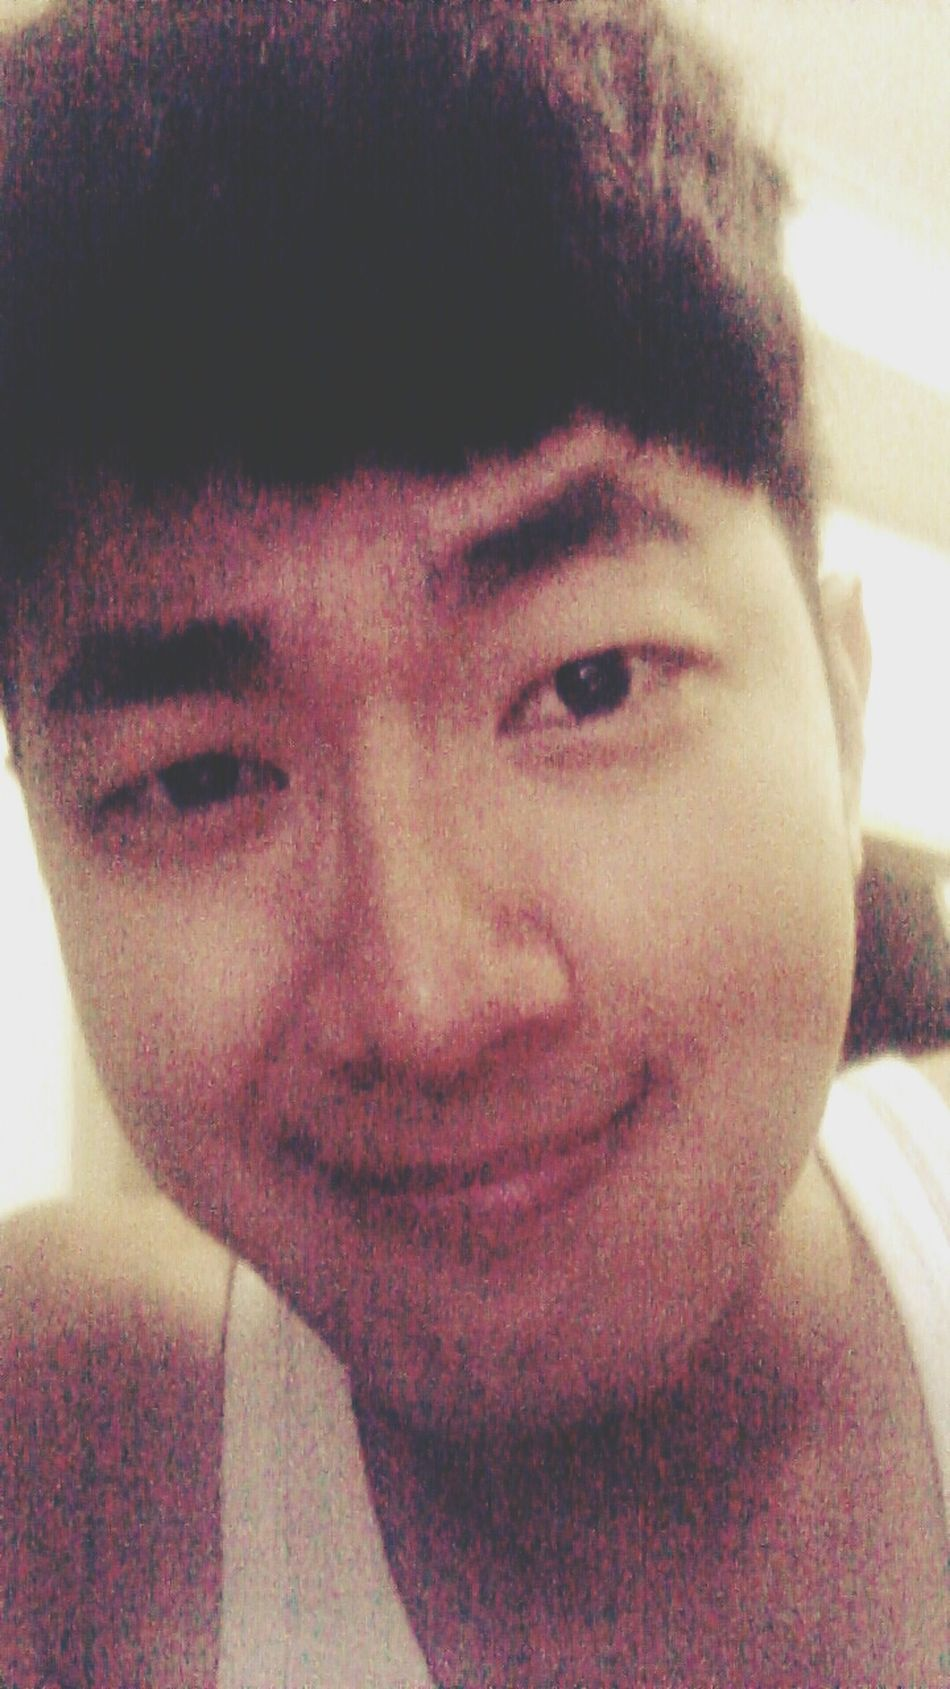 Stupid Boy 我頭髮真的很好笑嗎?,最近有人ㄧ直笑我欸………ヽ(`Д´)ノ 哈 算啦!whatever...